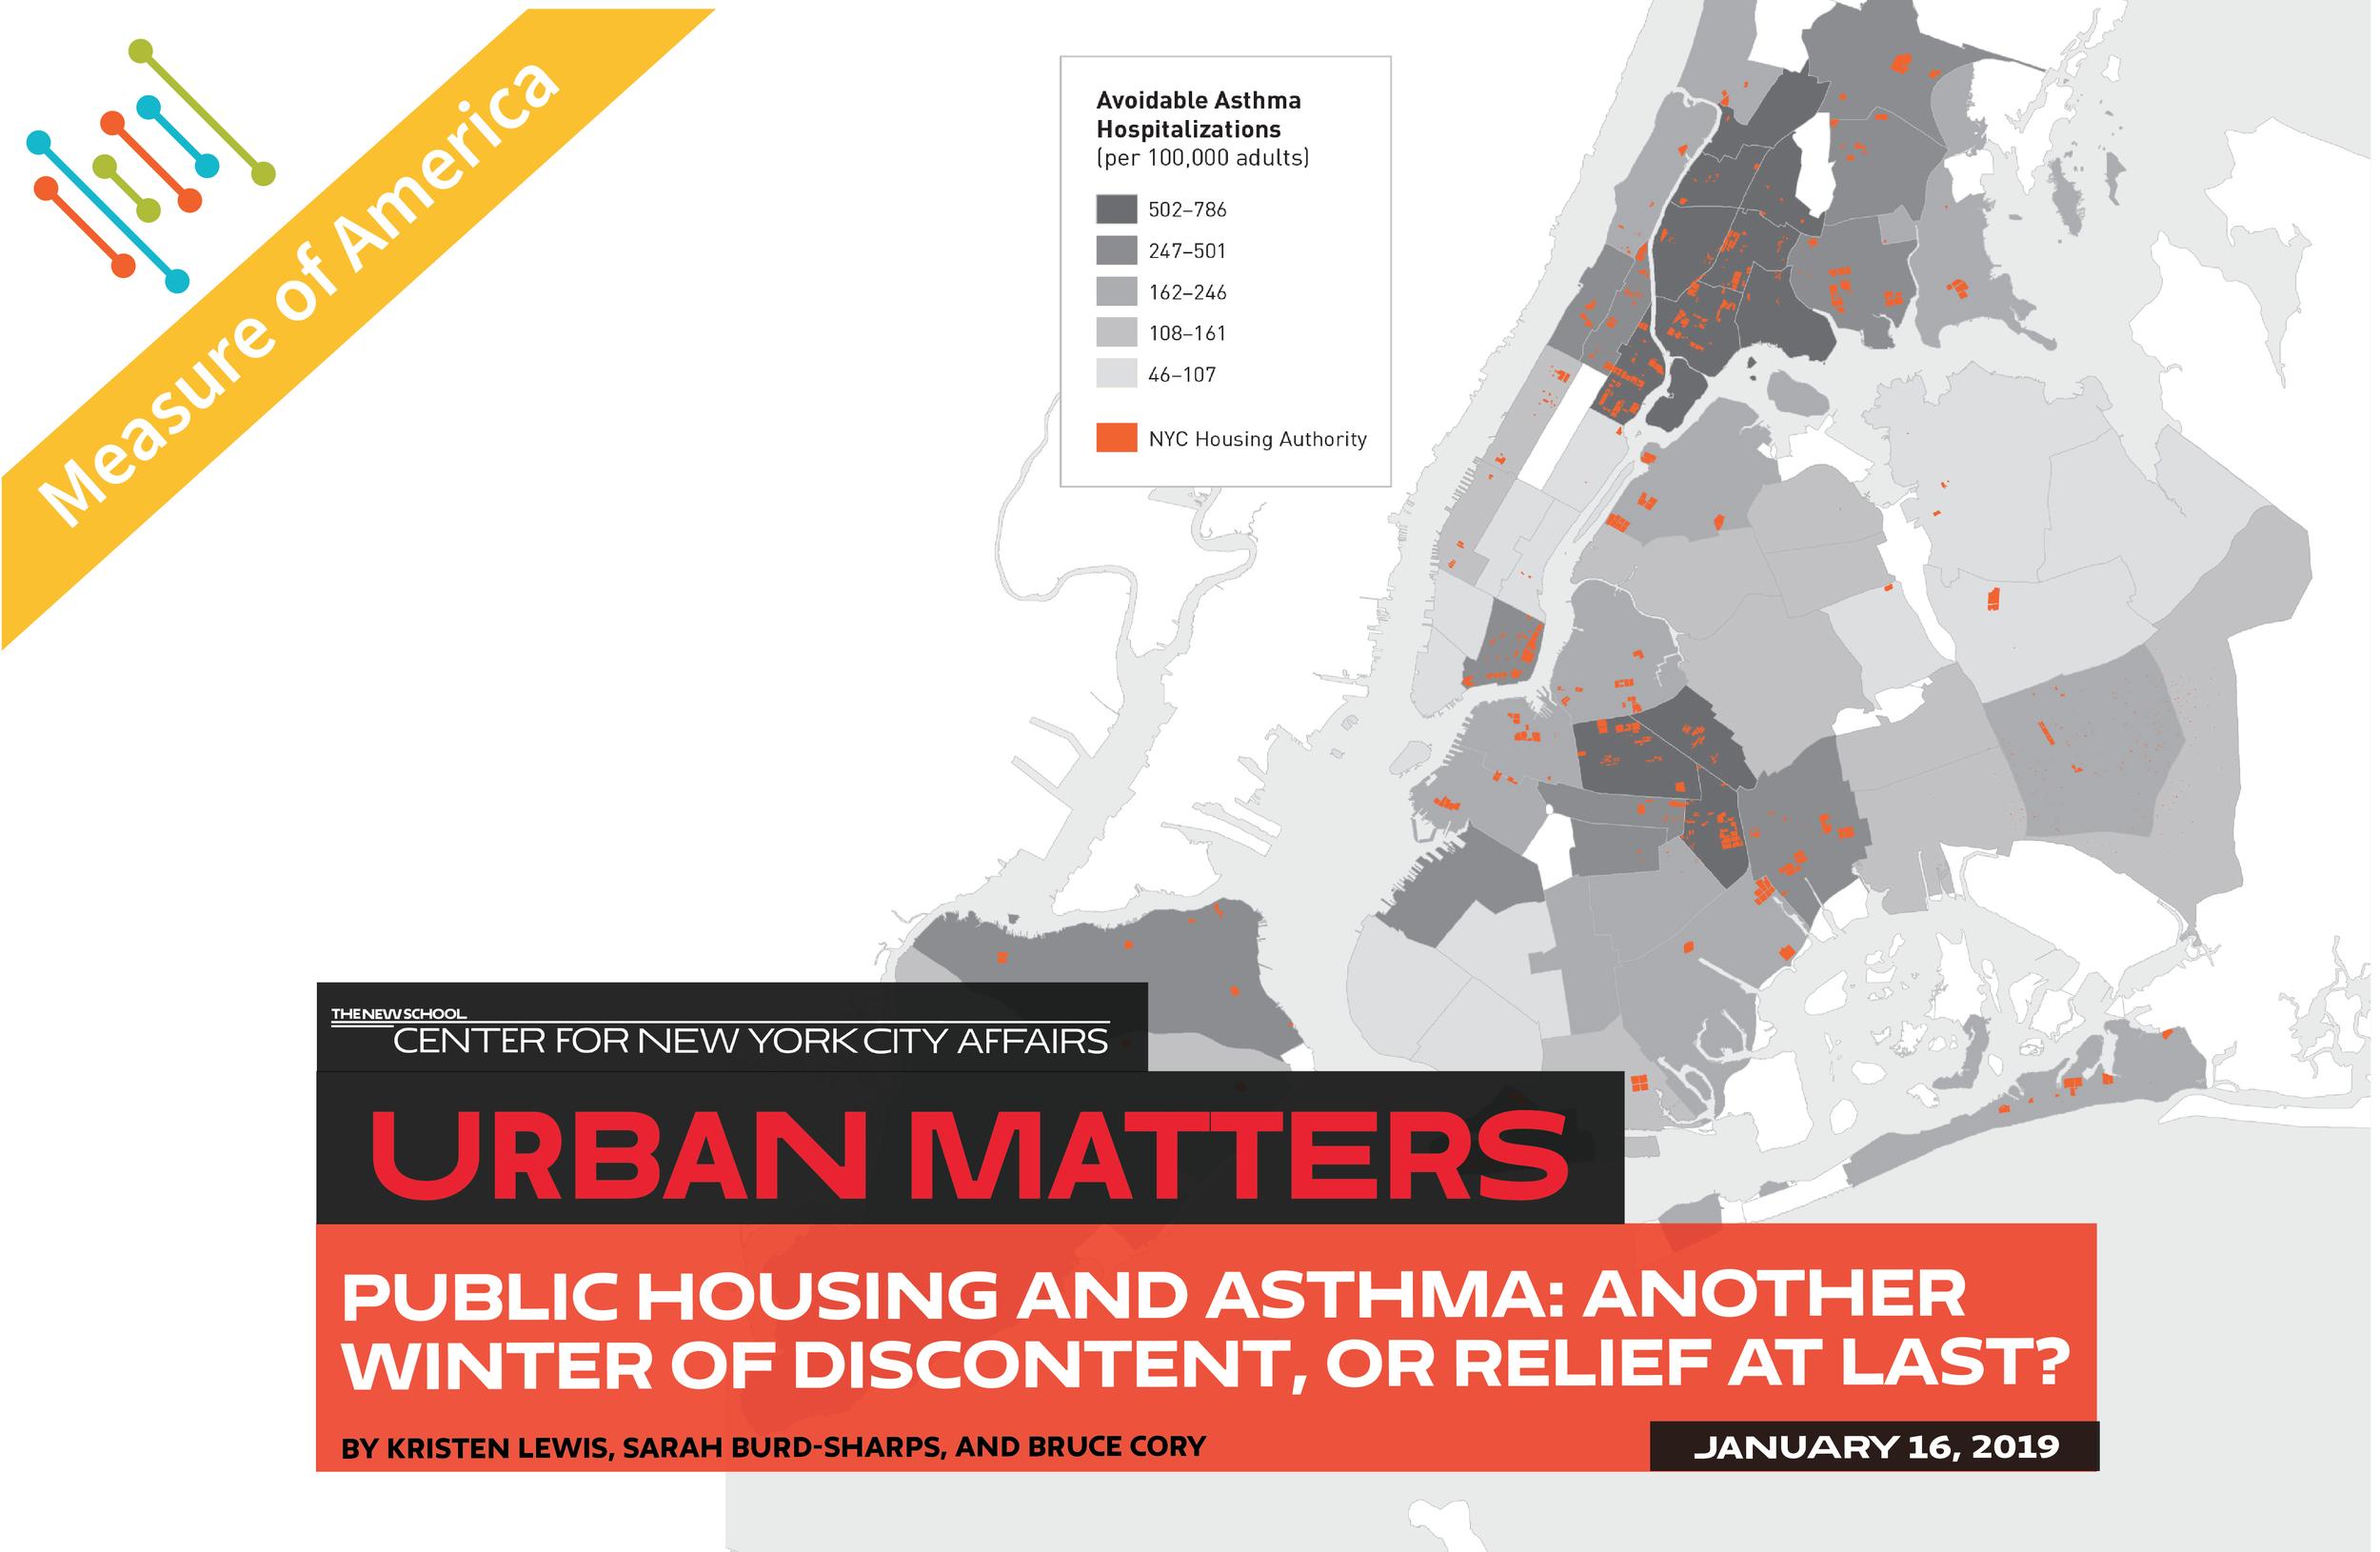 Housing & Homelessness — Center for New York City Affairs